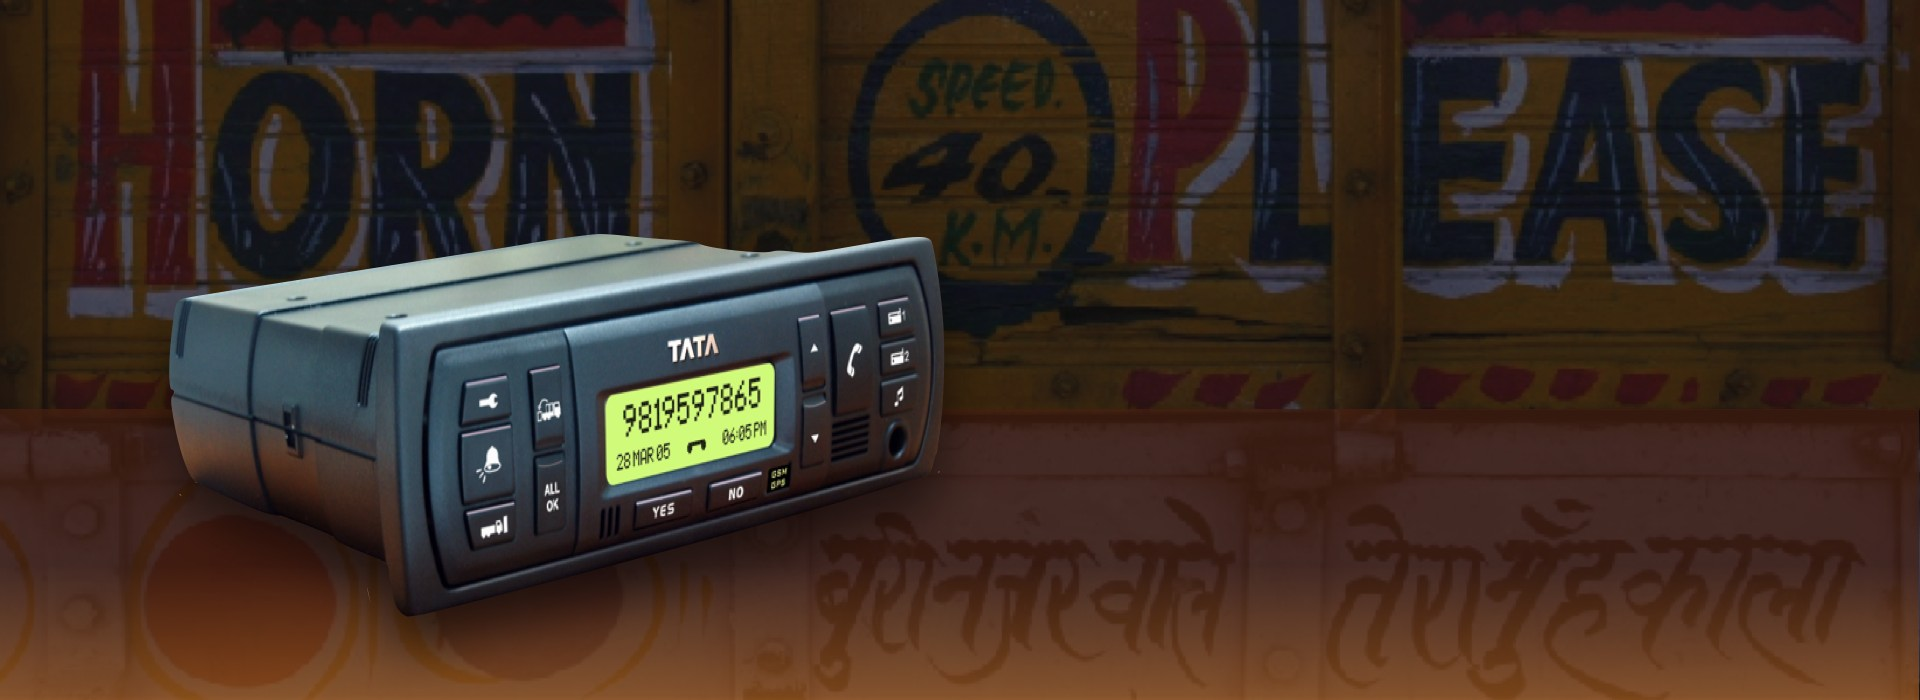 Vehicle Tracking System Design: Tata Motors